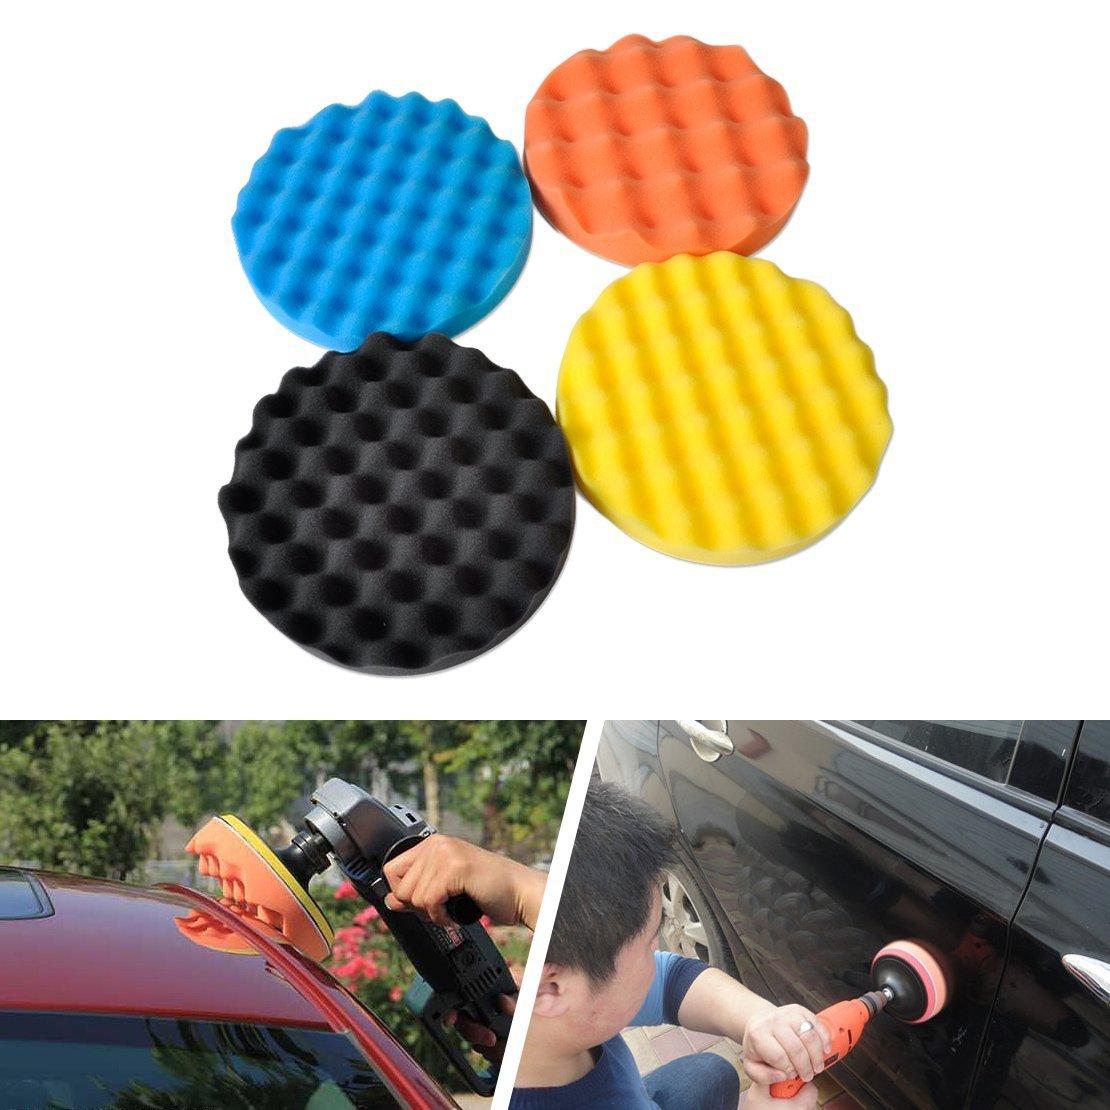 SHINA 4Pcs 7 inch Buffing Polishing Sponge Pads Kit For Car Polisher Buffer by SHINA (Image #2)